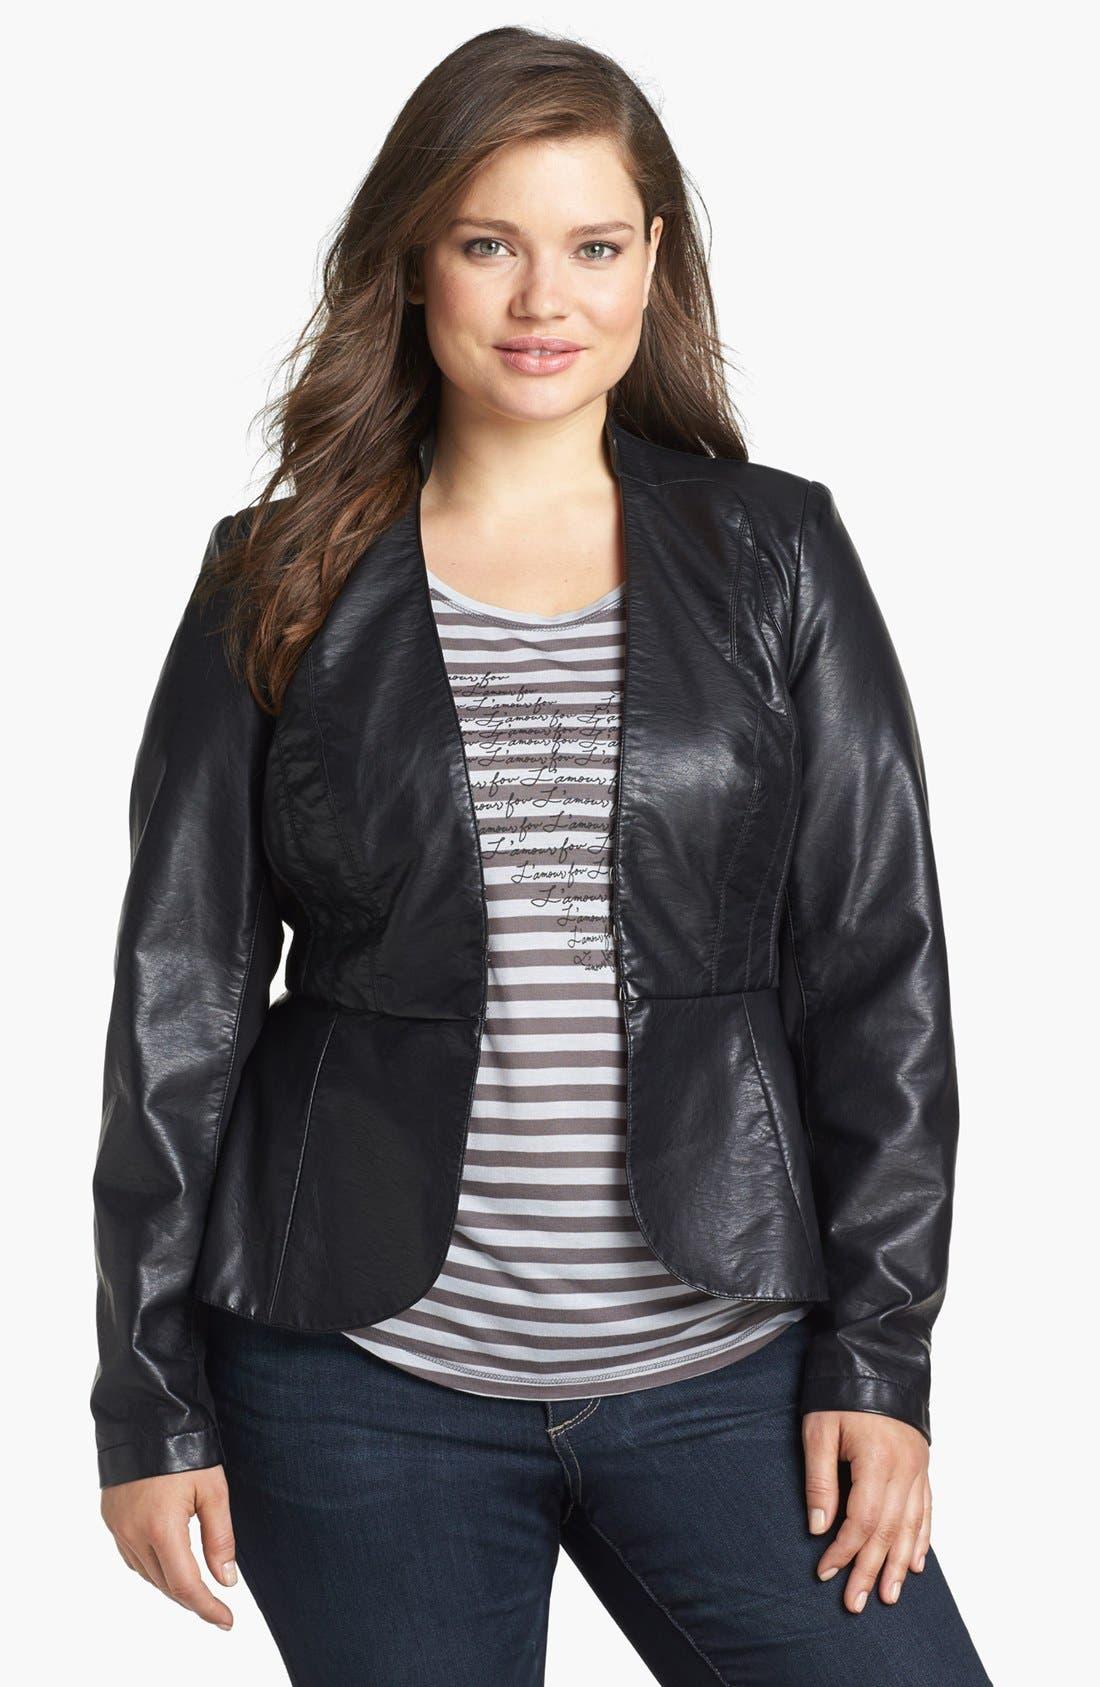 Alternate Image 1 Selected - City Chic 'Cruz' Faux Leather Jacket (Plus Size)